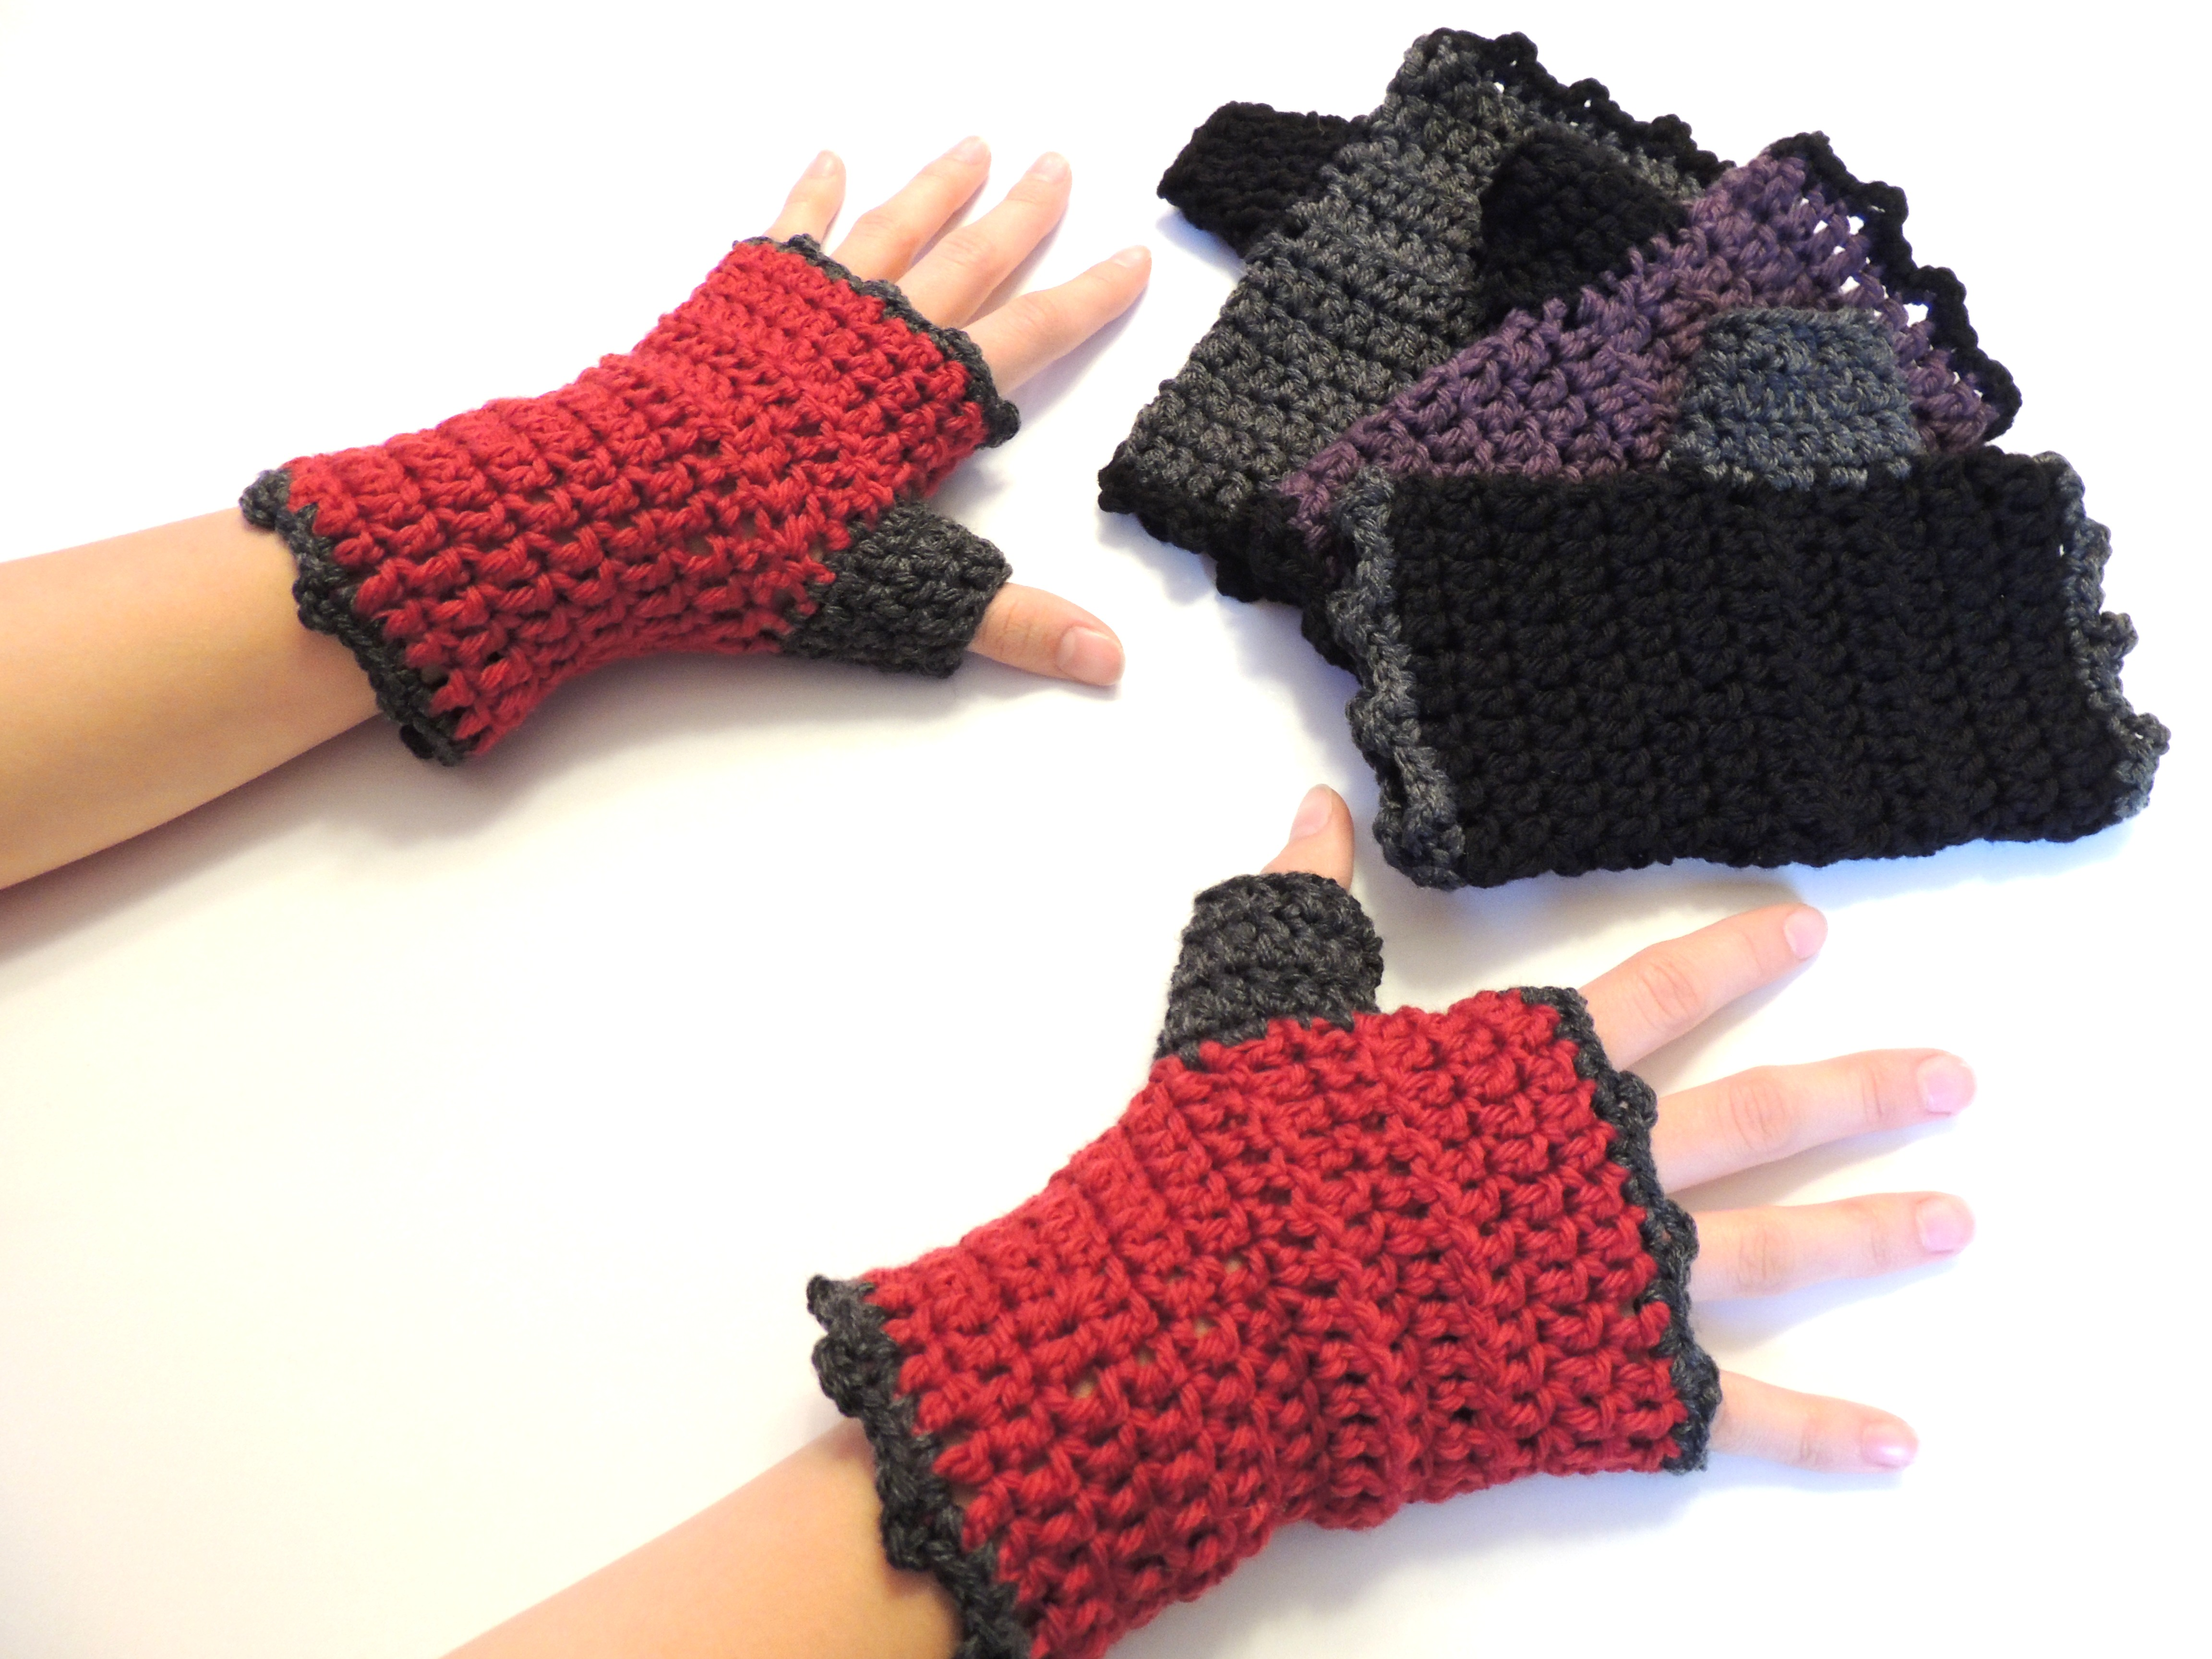 Fingerless gloves edmonton - Urban Lace Fingerless Gloves With Thumb Cozy